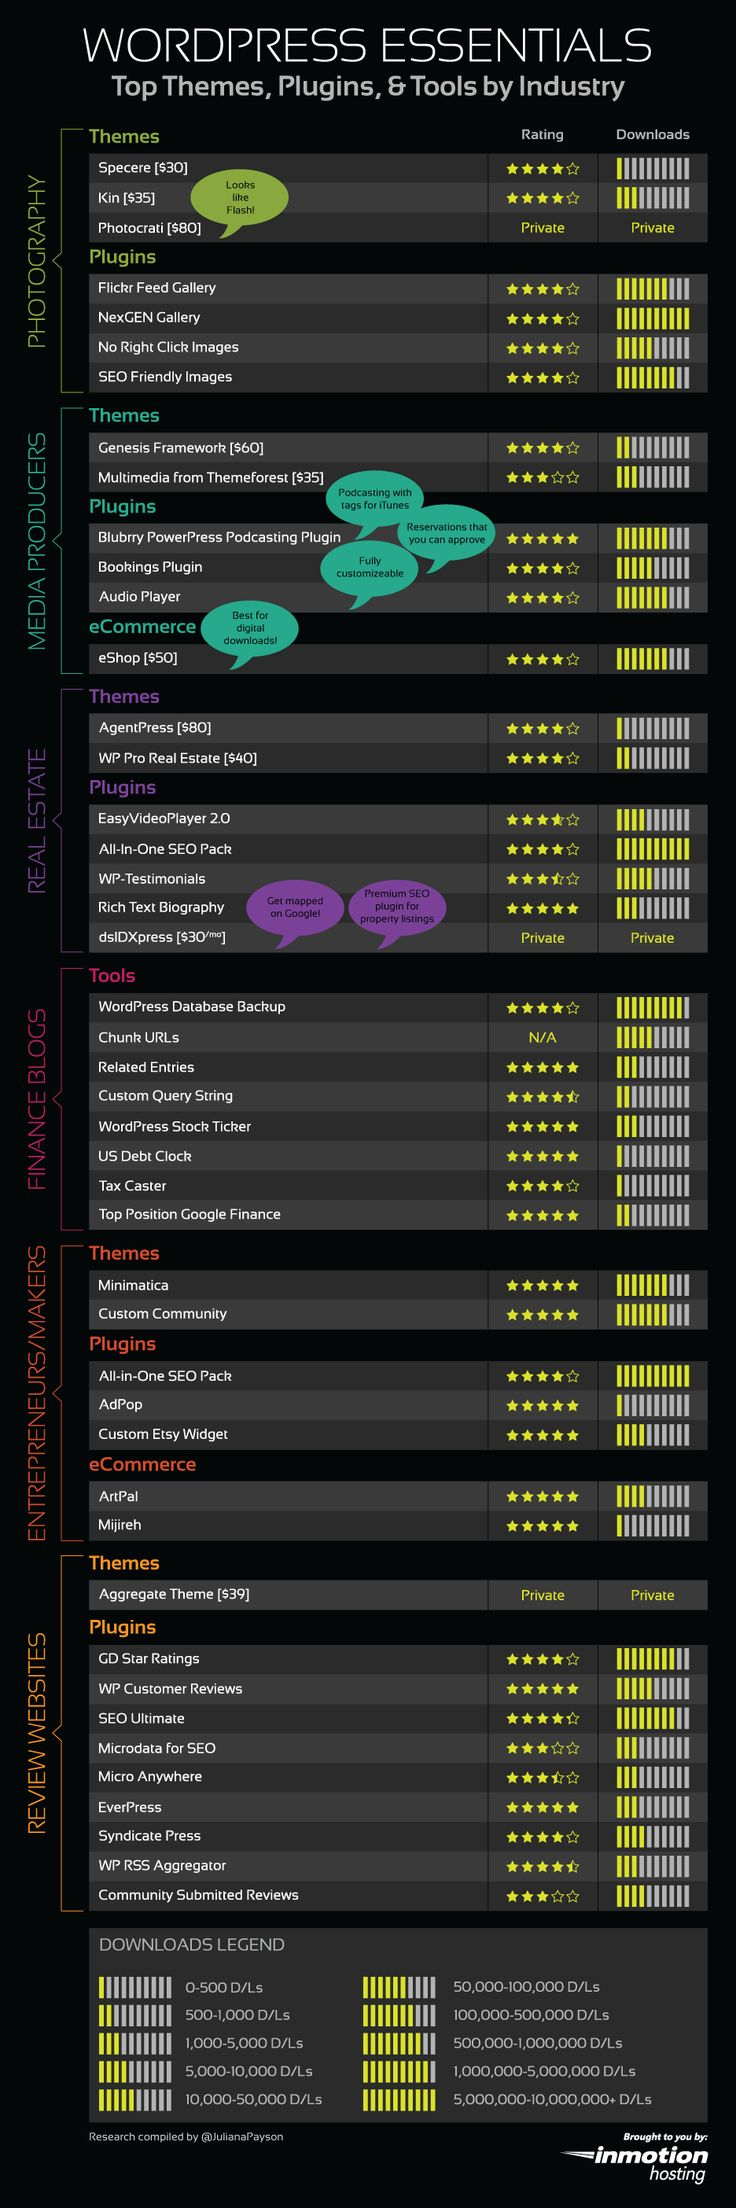 Top WordPress Essentials, Themes & Plugins > InfoGraphic Goodies